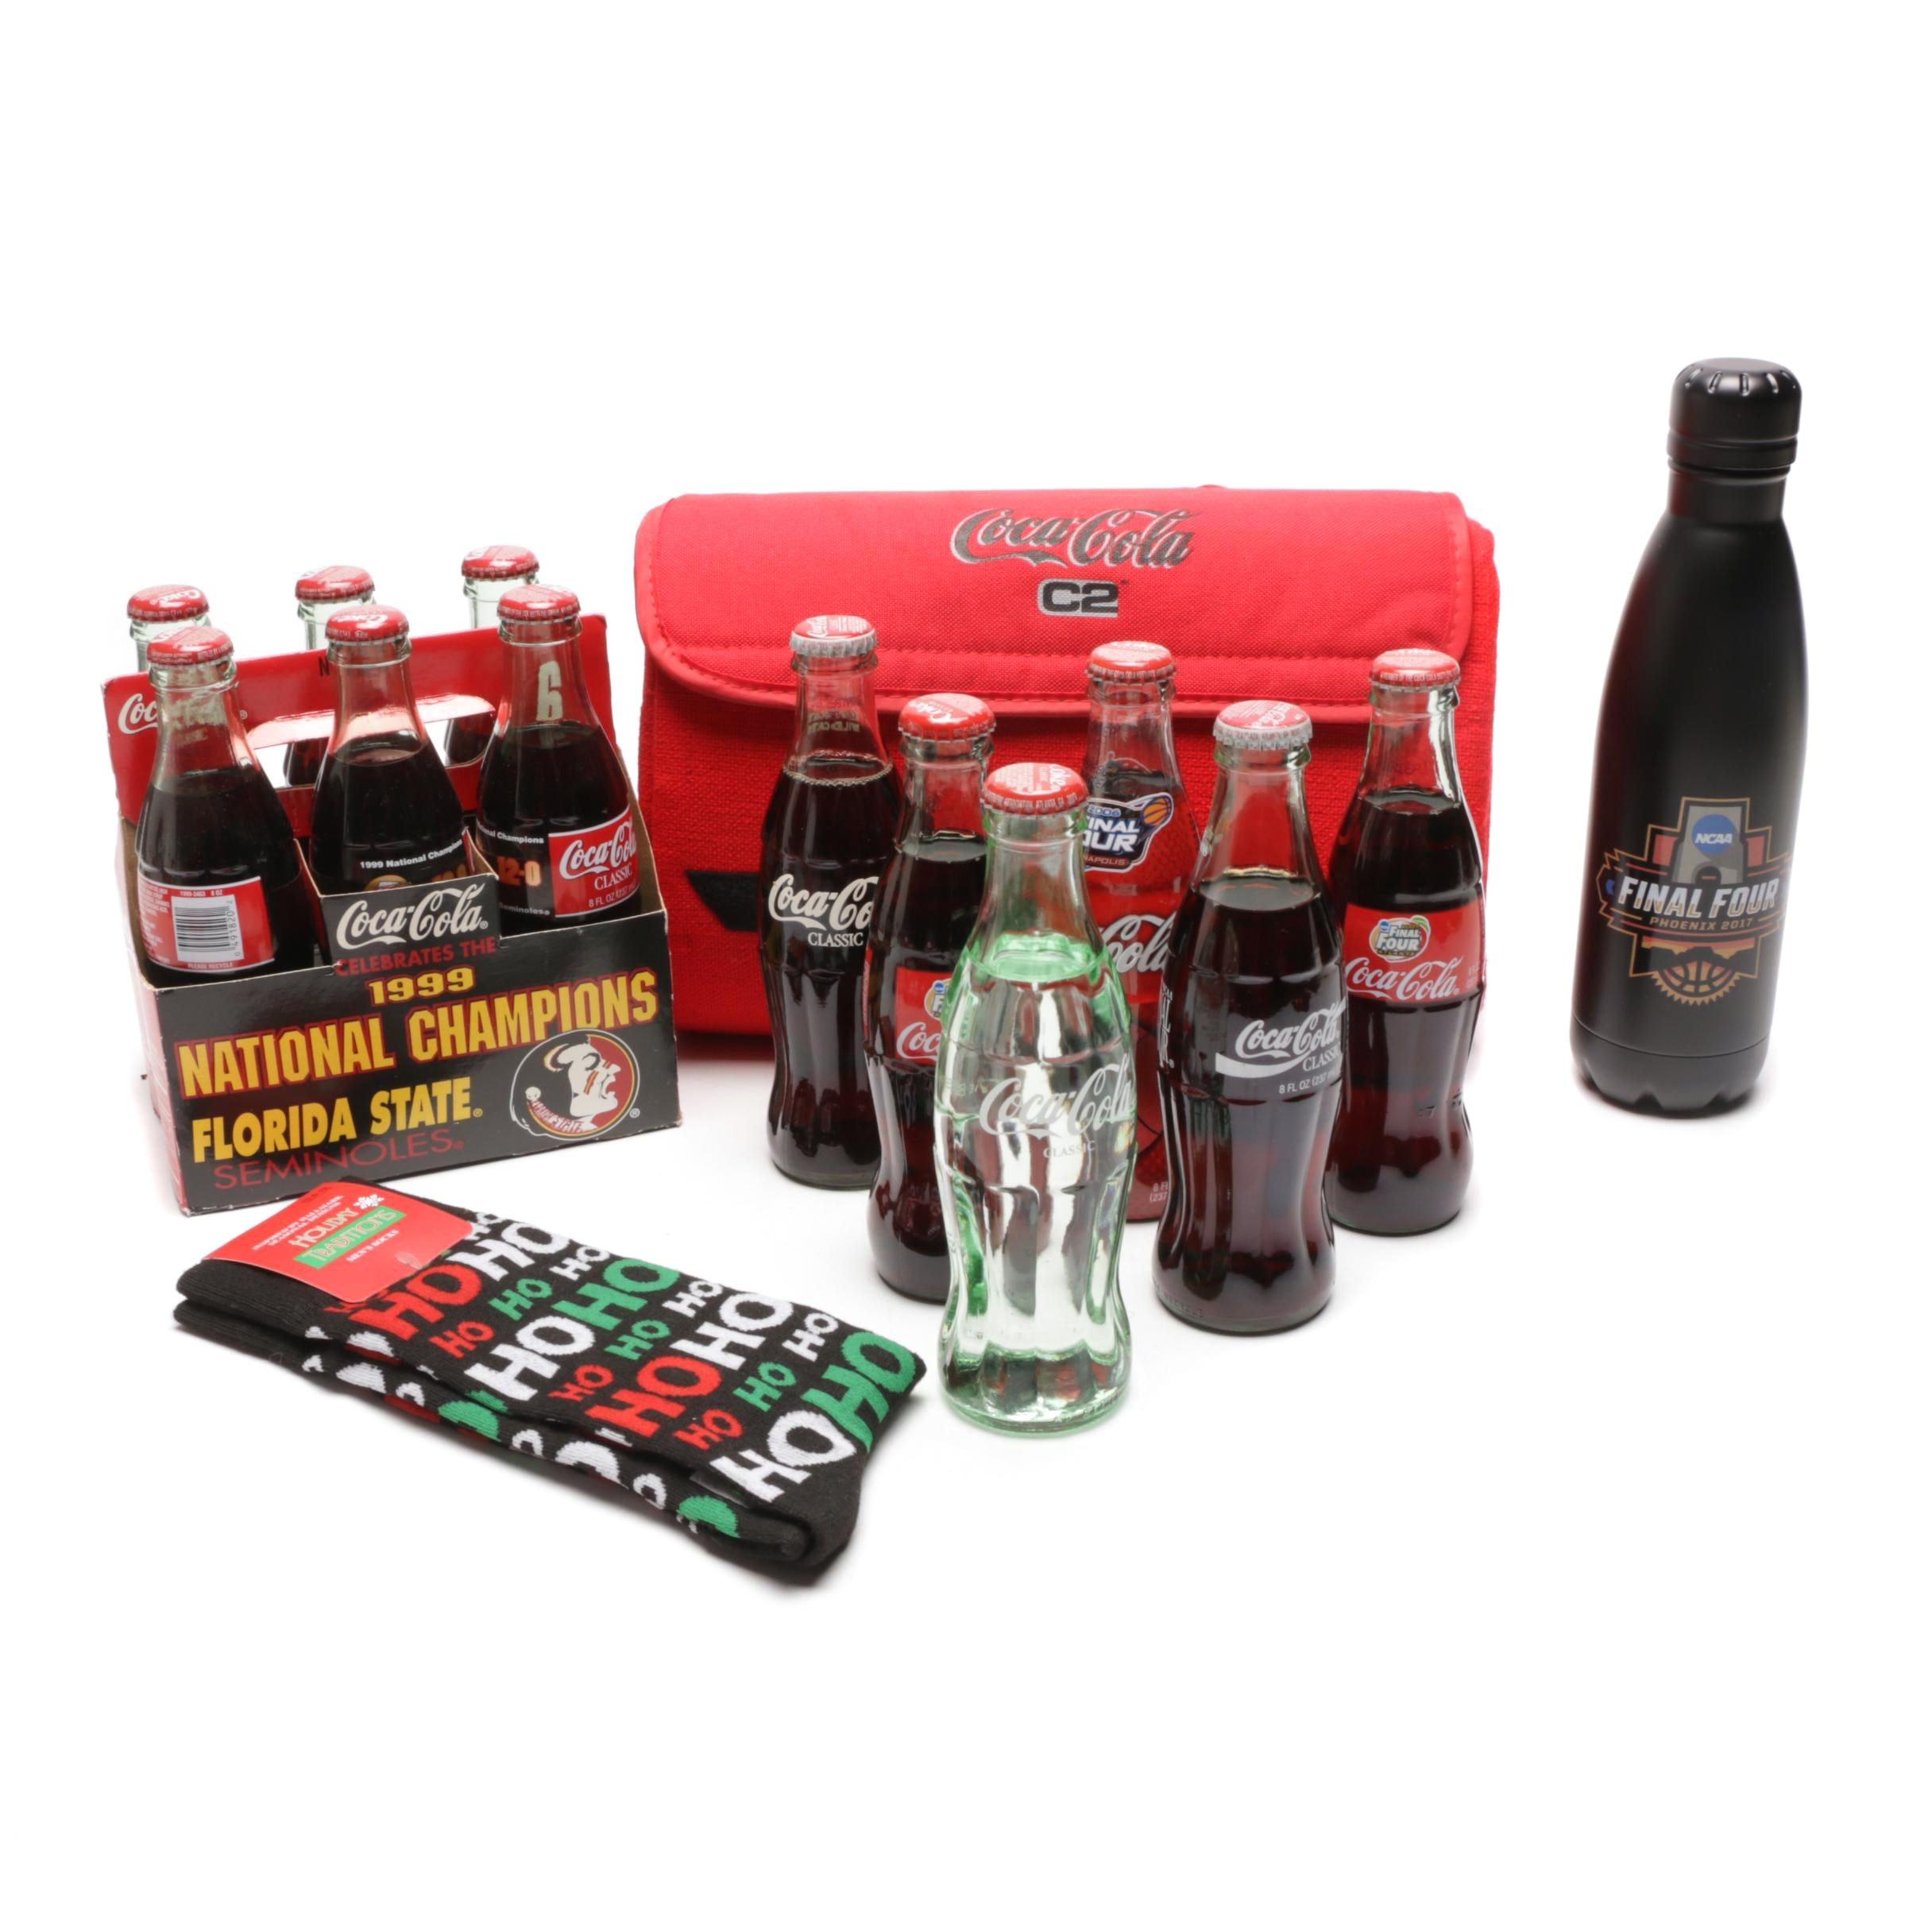 Coke Final Four, Football & Alli Commemorative Bottles and Bags